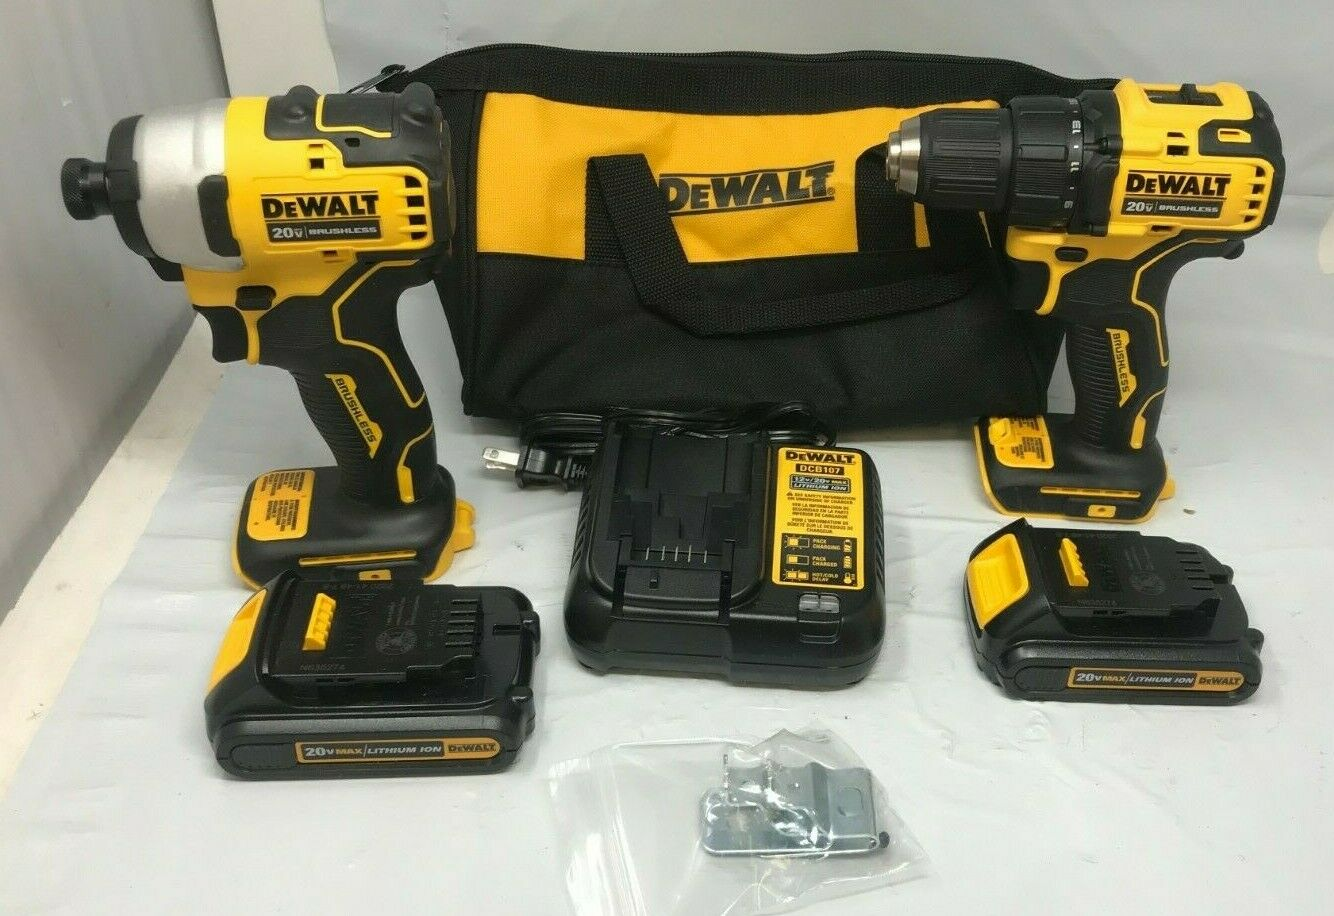 DEWALT DCK278C2 ATOMIC 20V MAX 2-Tool Brushless Combo Kit, N